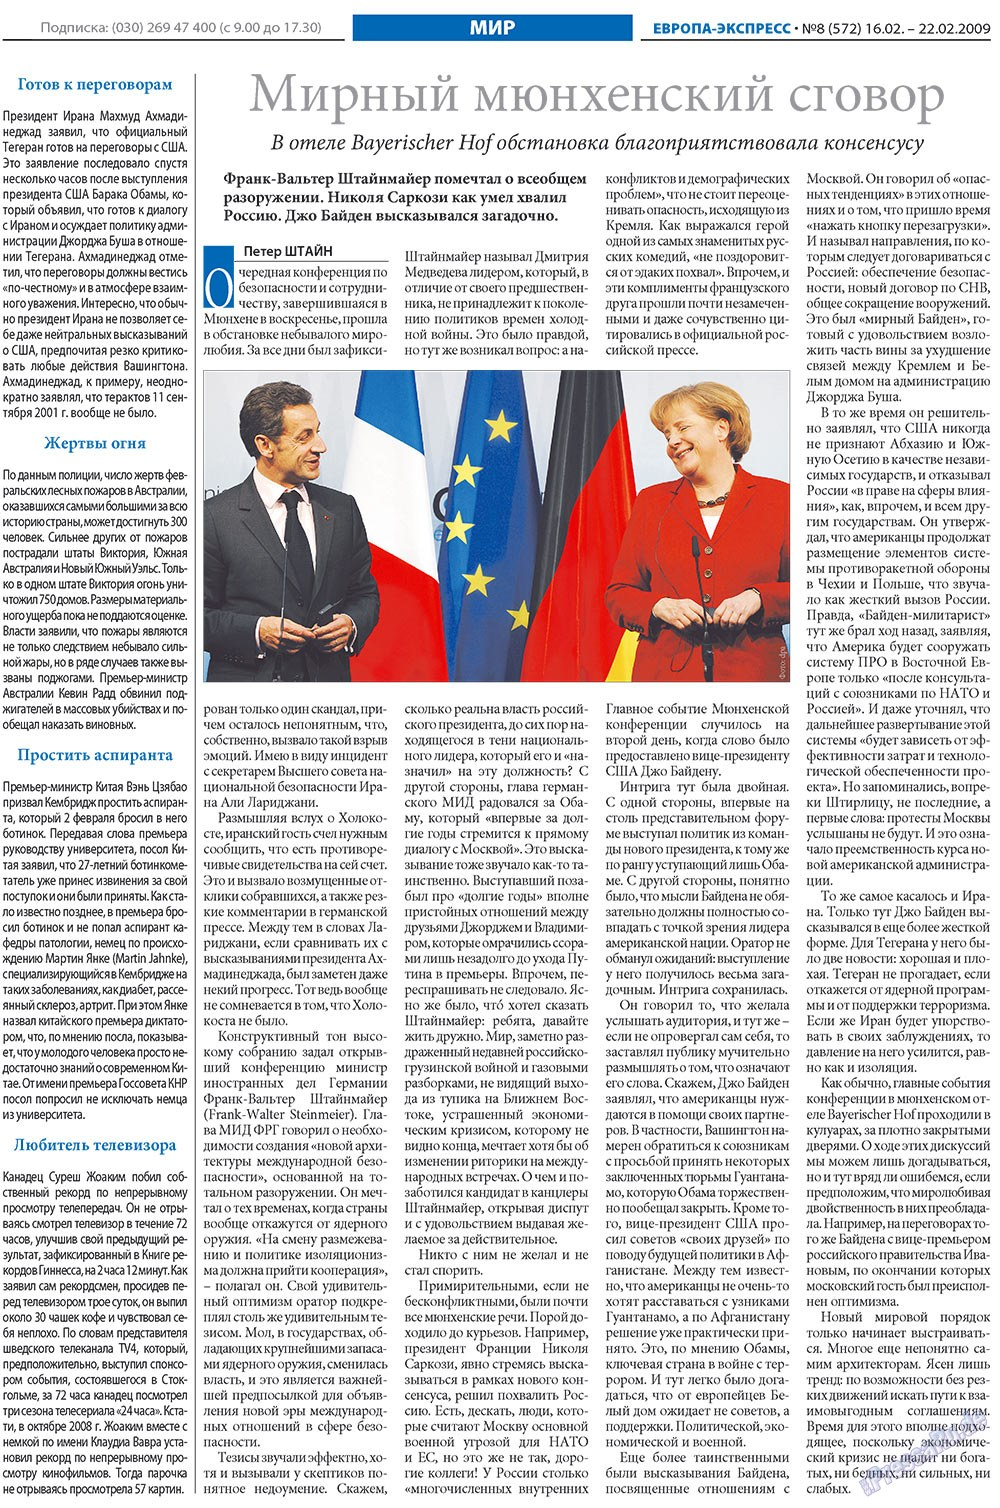 Европа экспресс (газета). 2009 год, номер 8, стр. 8